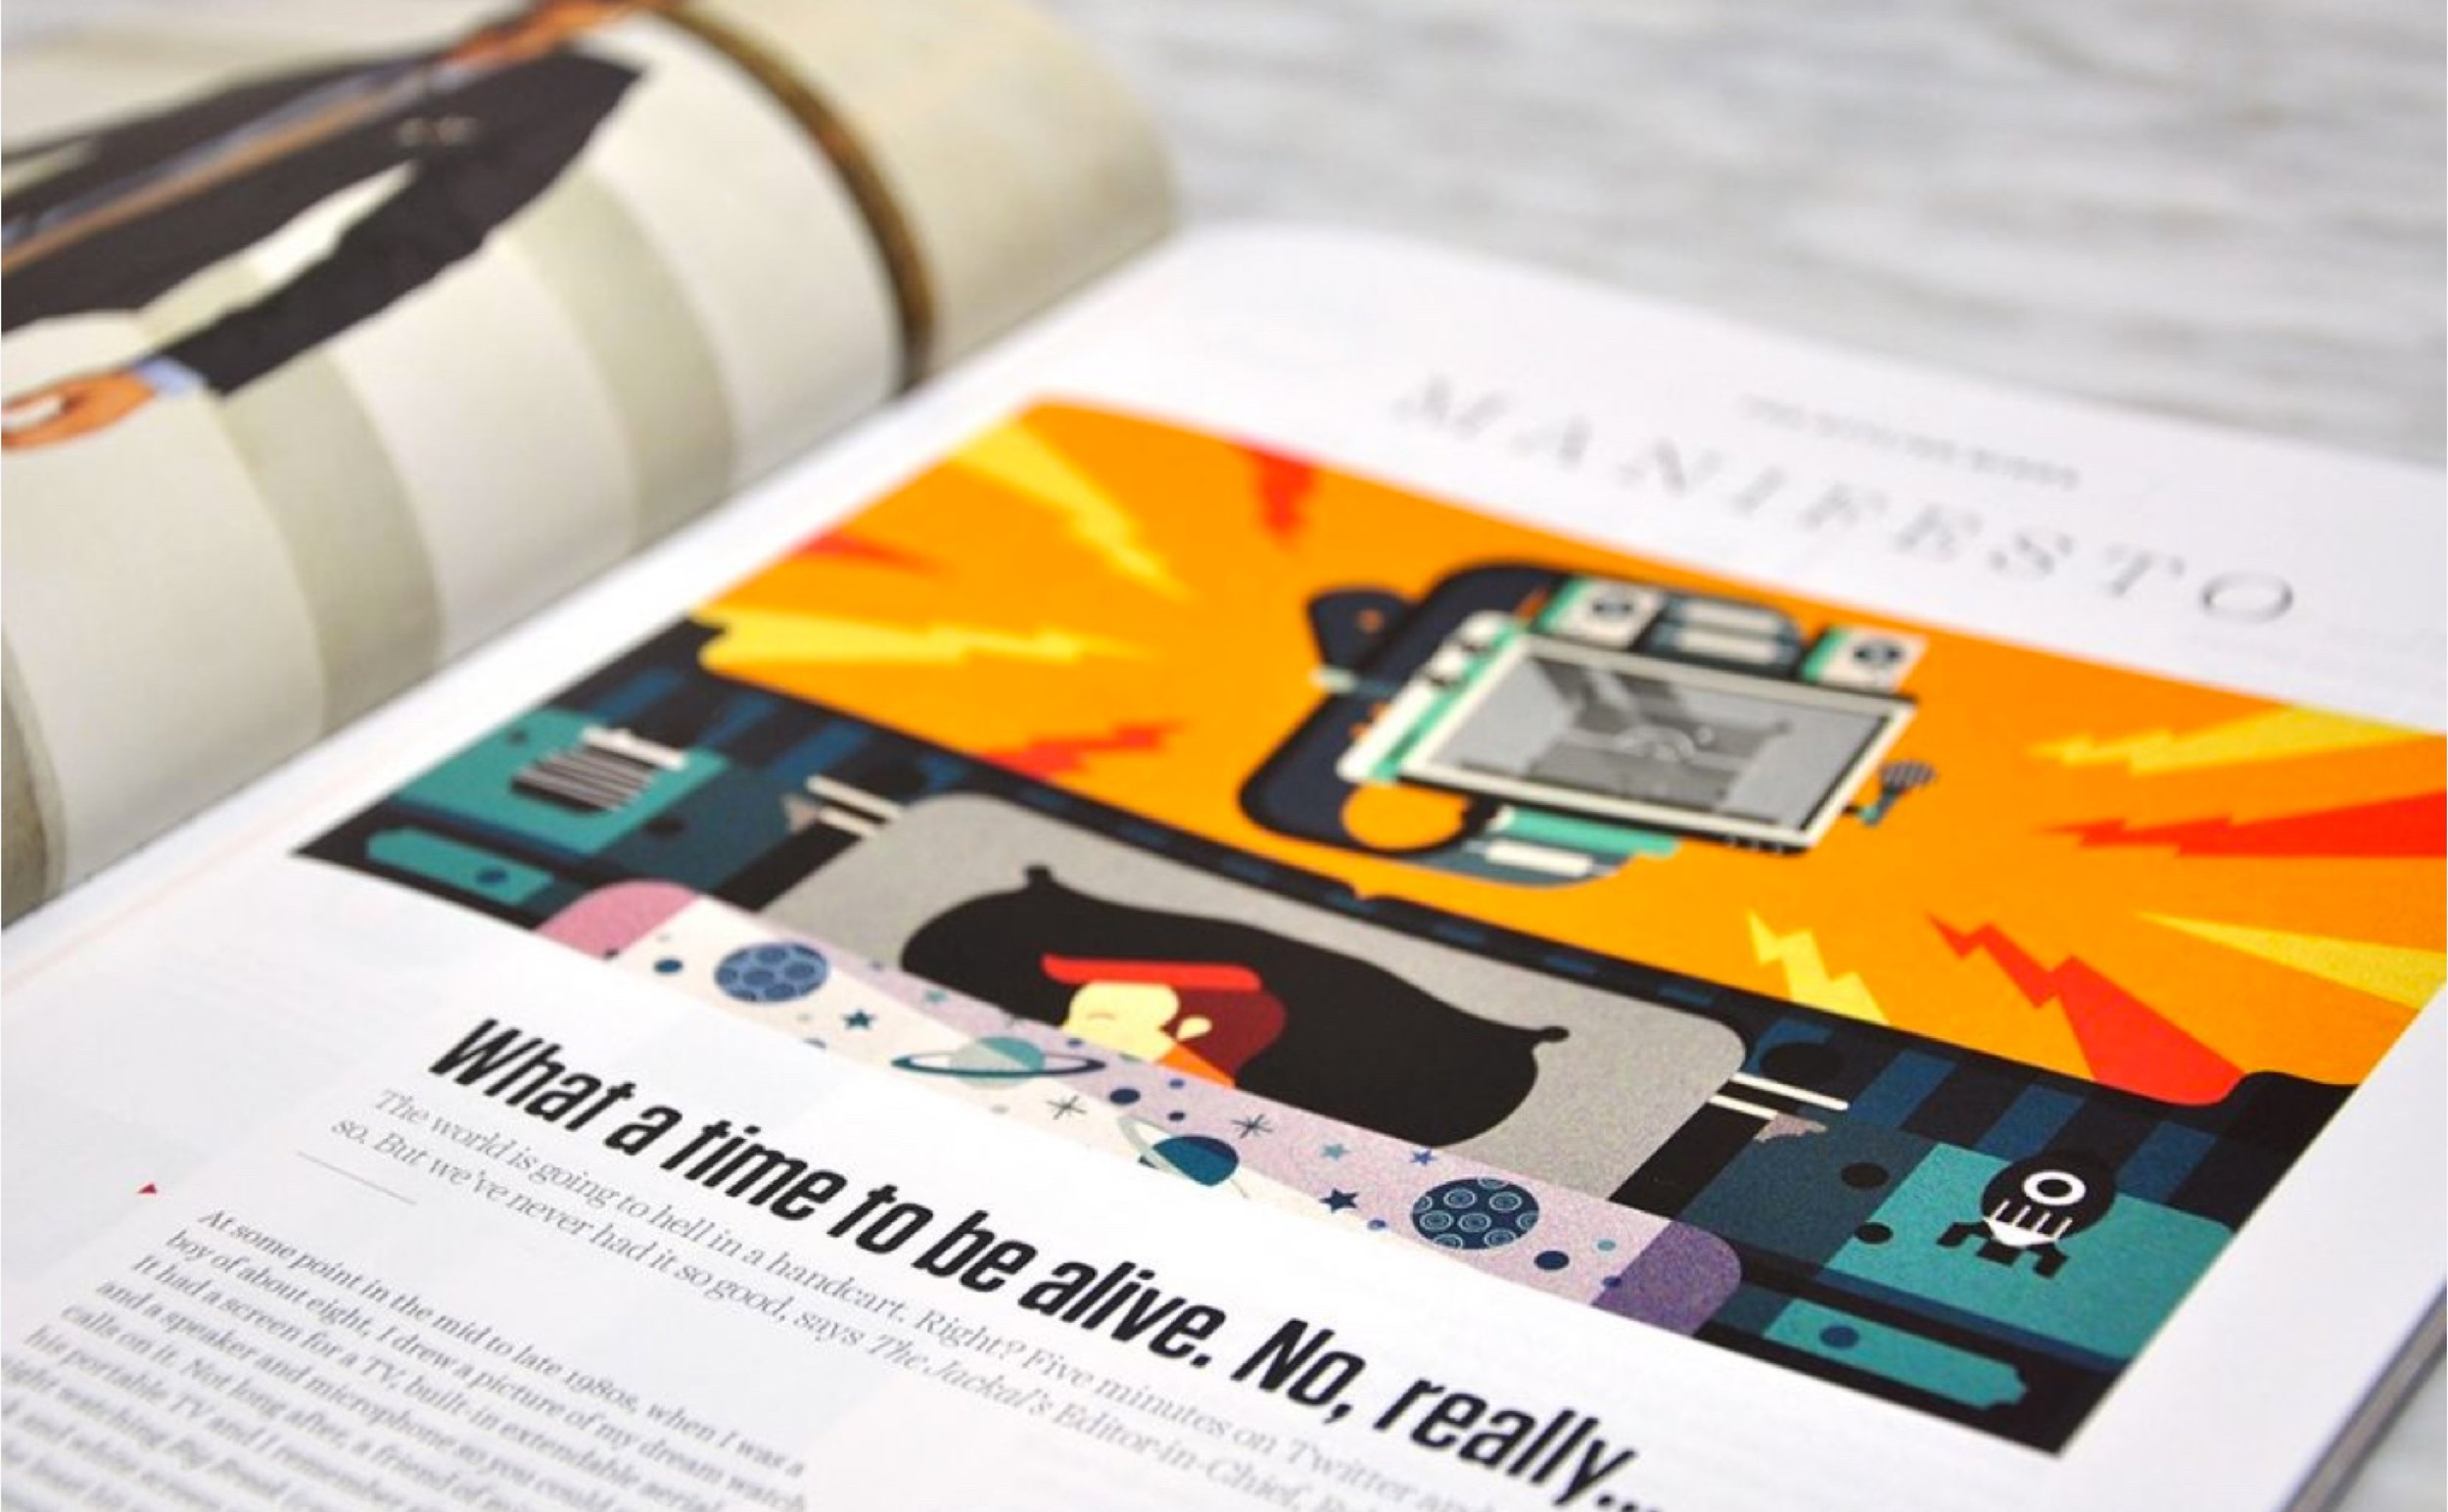 The Jackal Magazine